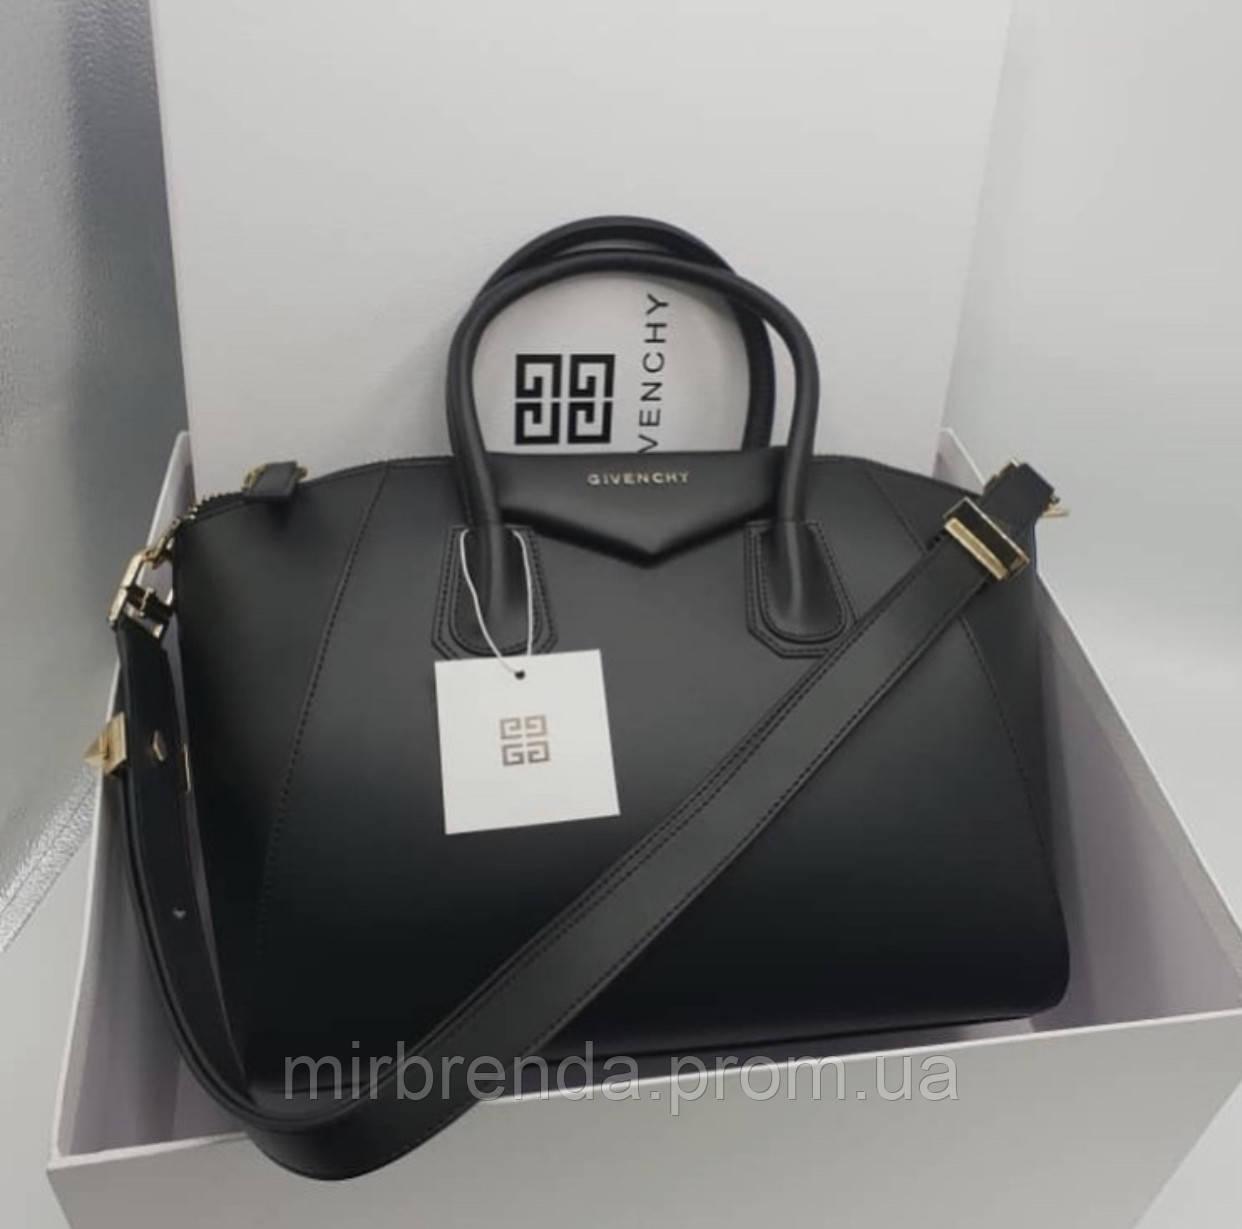 ff69457704a6 Брендовые сумки реплика - Givenchy, цена 1 400 грн., купить в Одессе ...